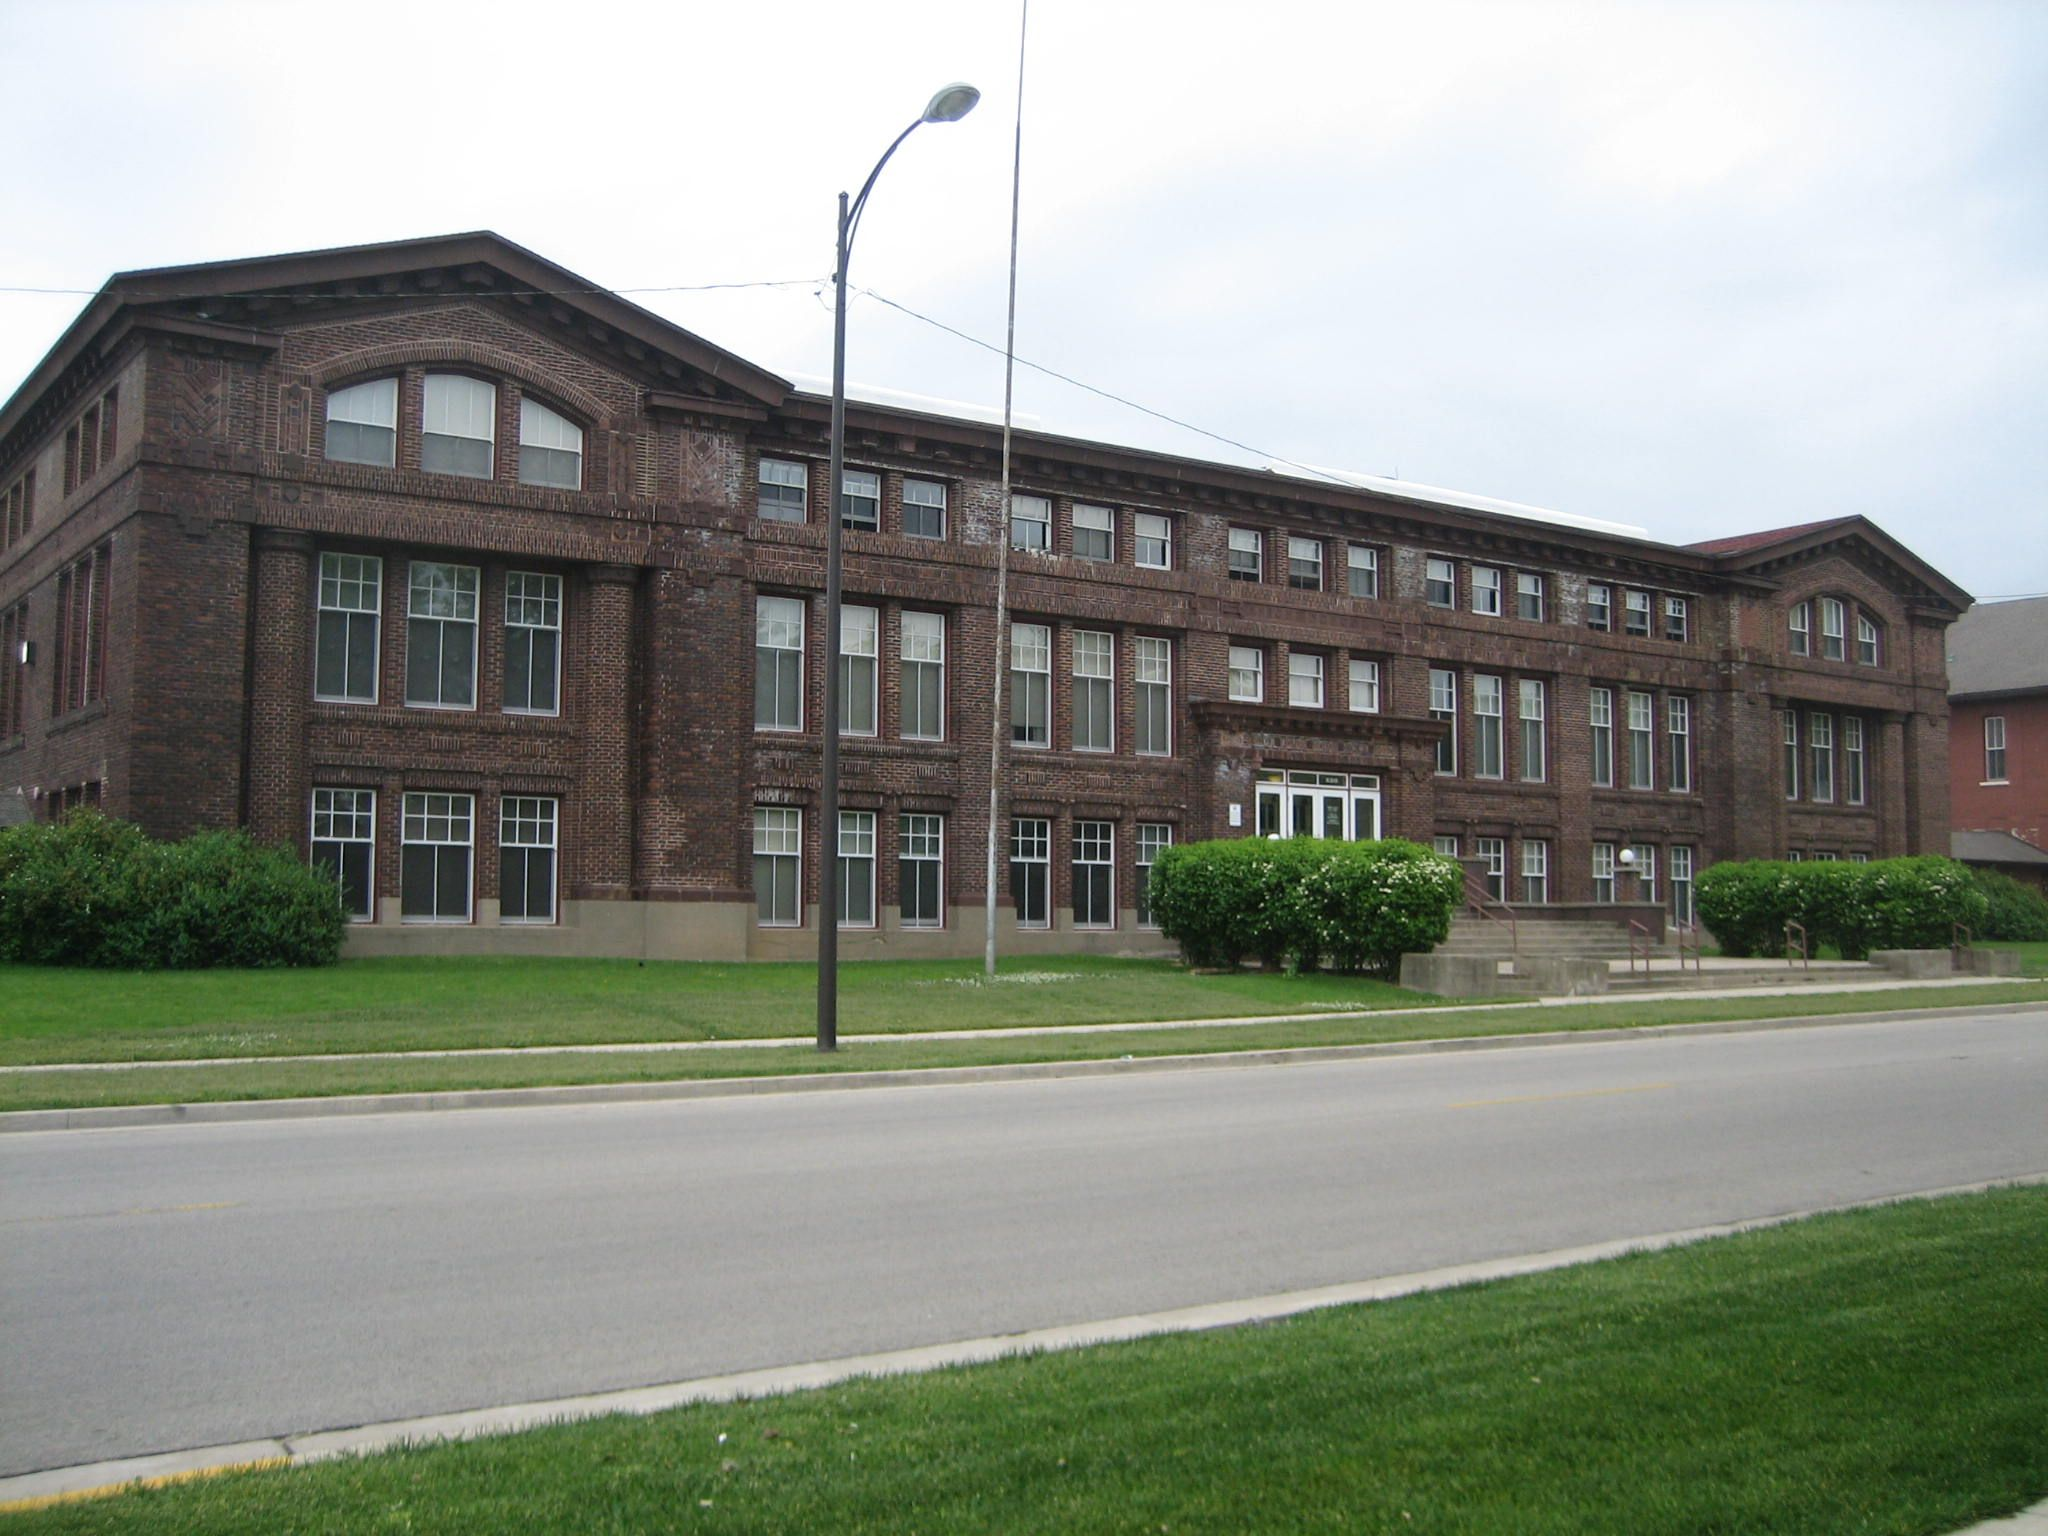 Belvidere Il Old Belvidere High School Was My Junior High School Building House Styles School Building